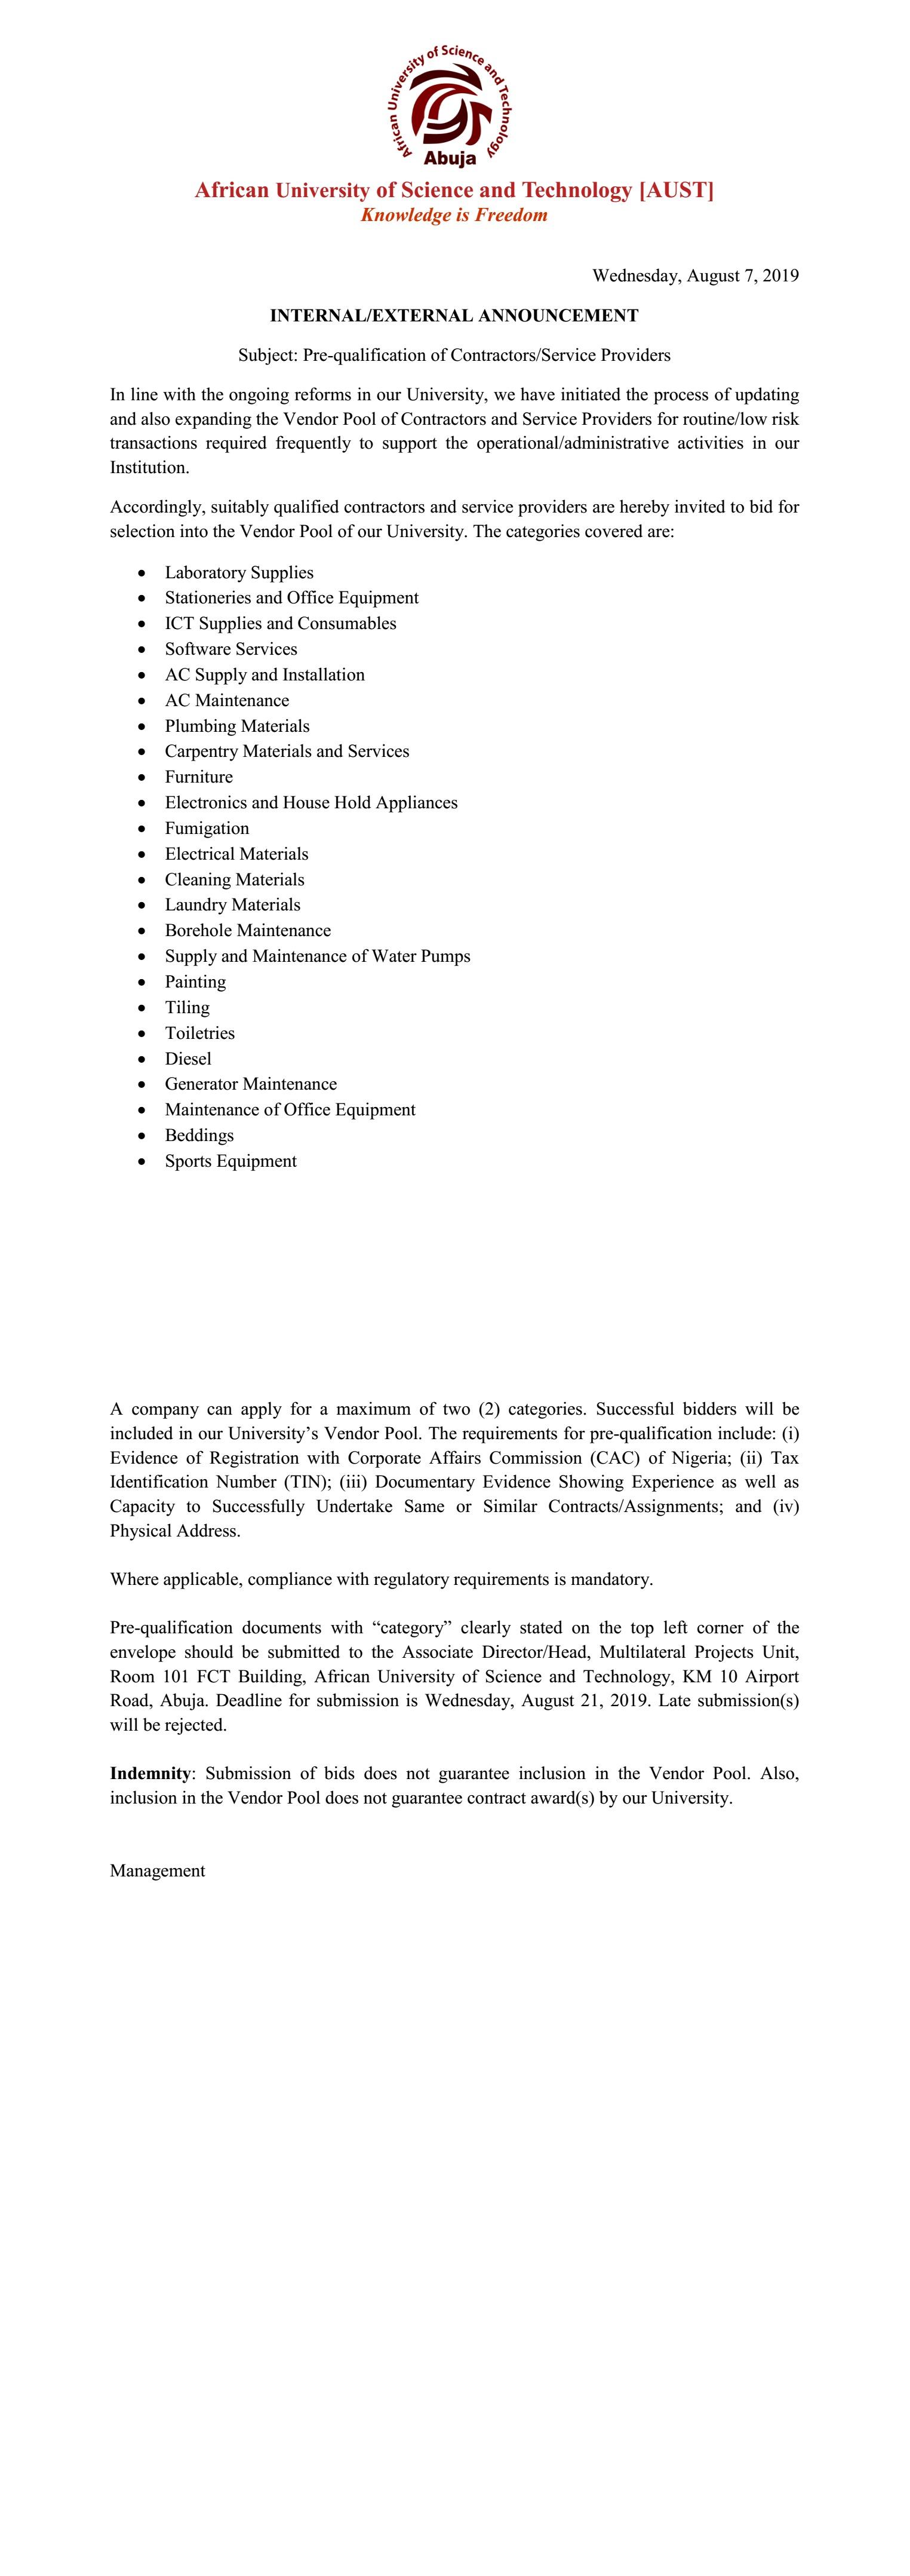 INTERNAL/EXTERNAL ANNOUNCEMENT (Pre-qualification of Contractors/Service Providers)